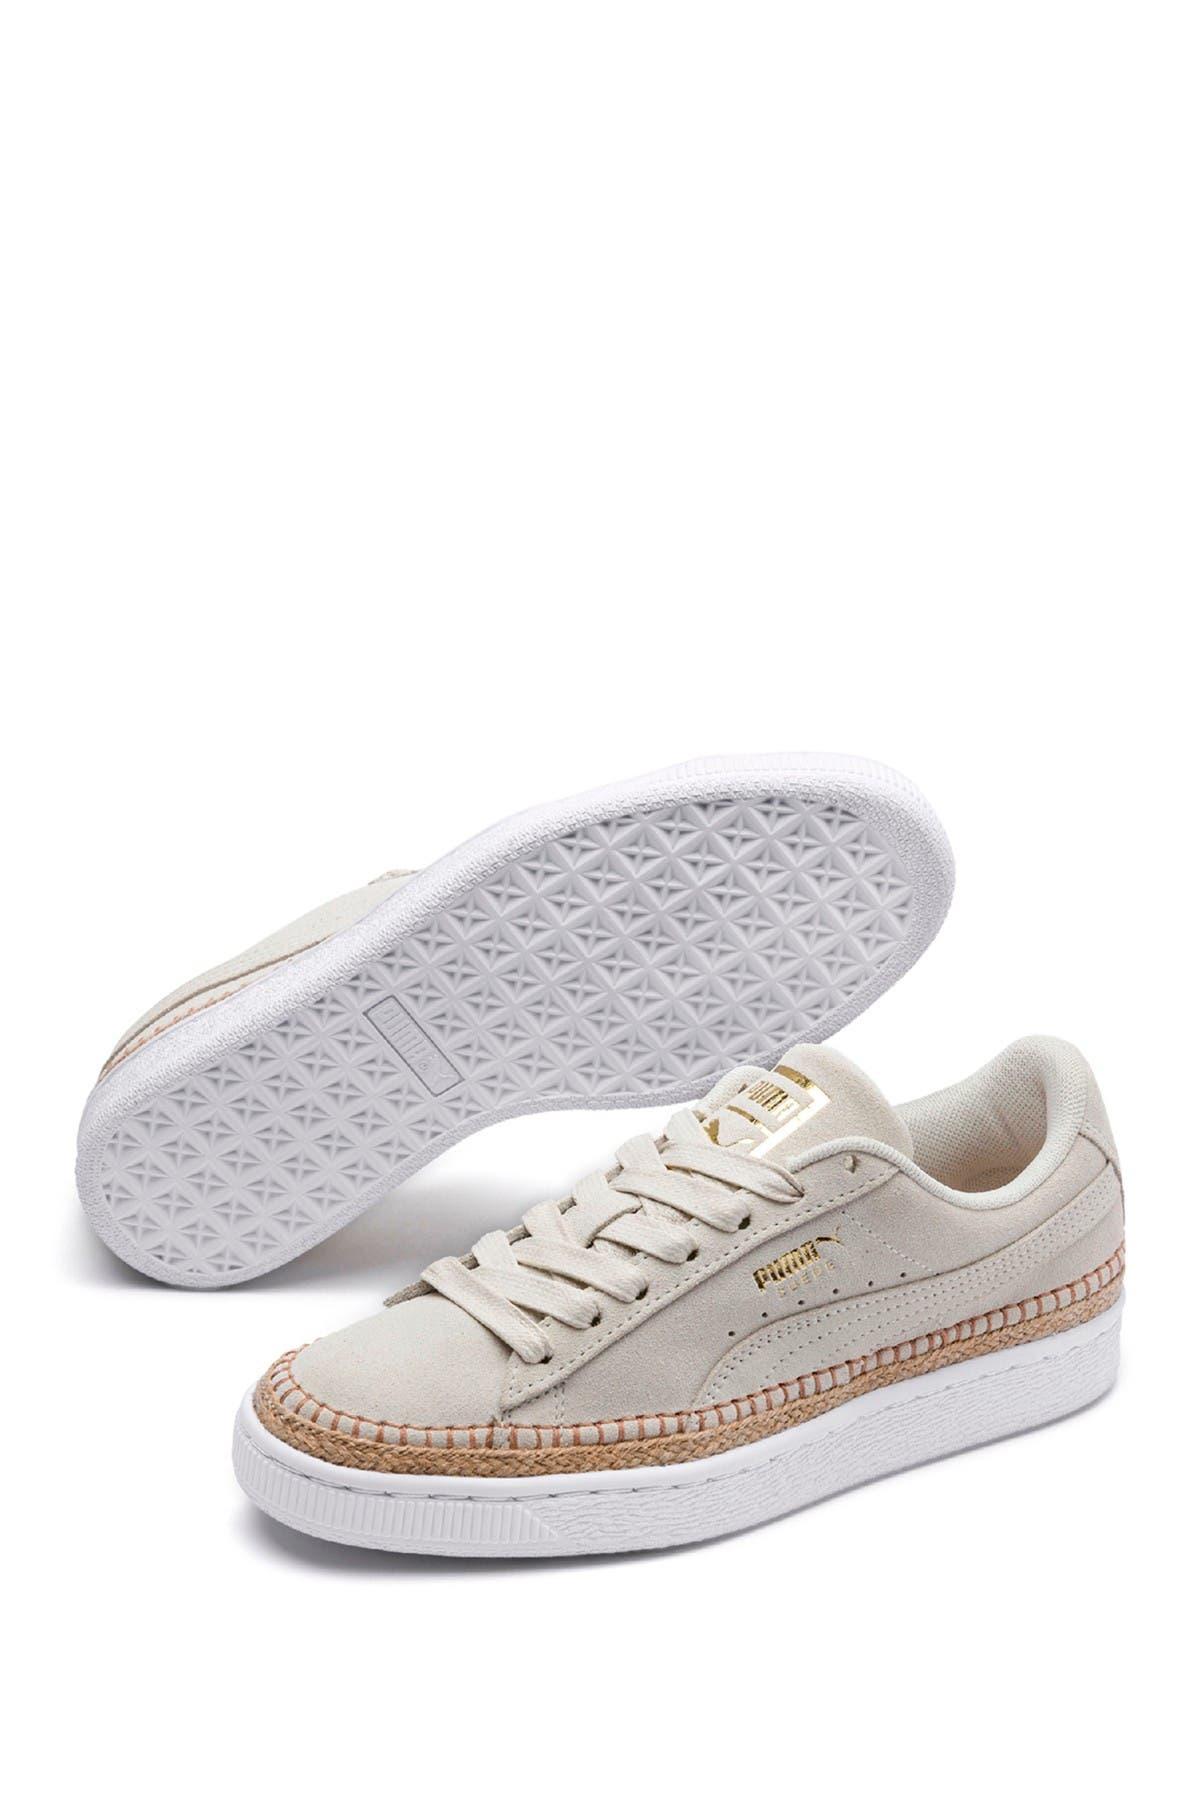 PUMA | Suede Sneakerdrille | Nordstrom Rack